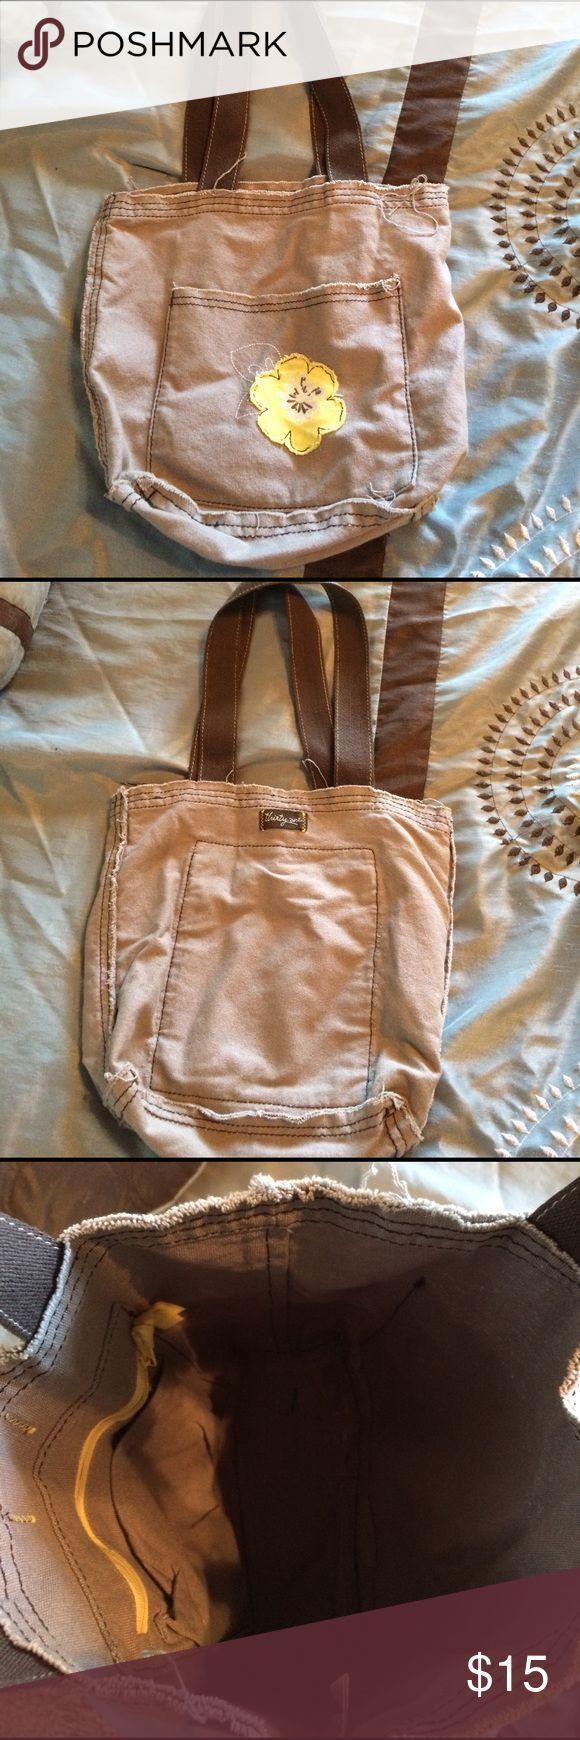 31 purse Fun handbag! Khaki is color with a fun yellow flower! thirty one Bags Hobos